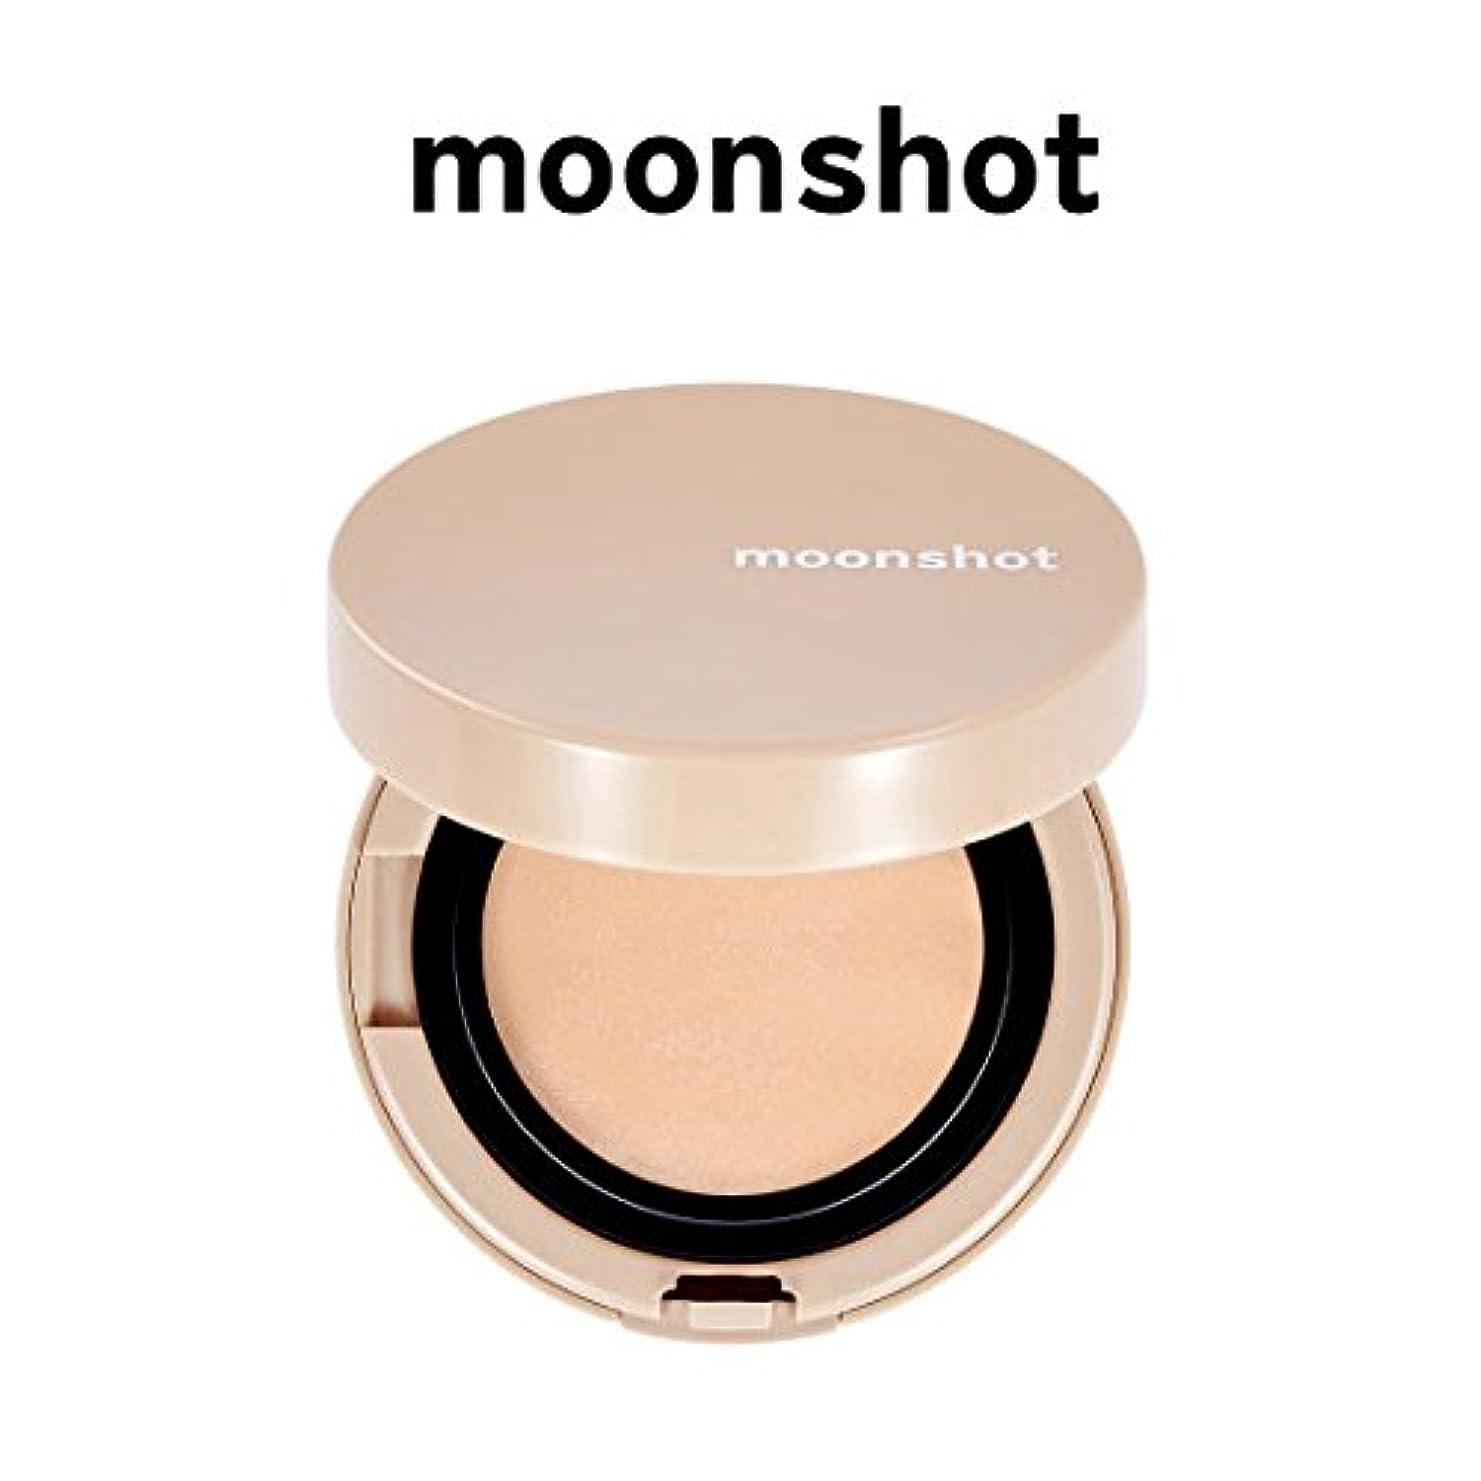 [MOONSHOT] BLACKPINK クッション SPF 50+PA+++ / Face Perfection Balm Cushion 12g / ムーンショット正品?海外直送品 (#301)